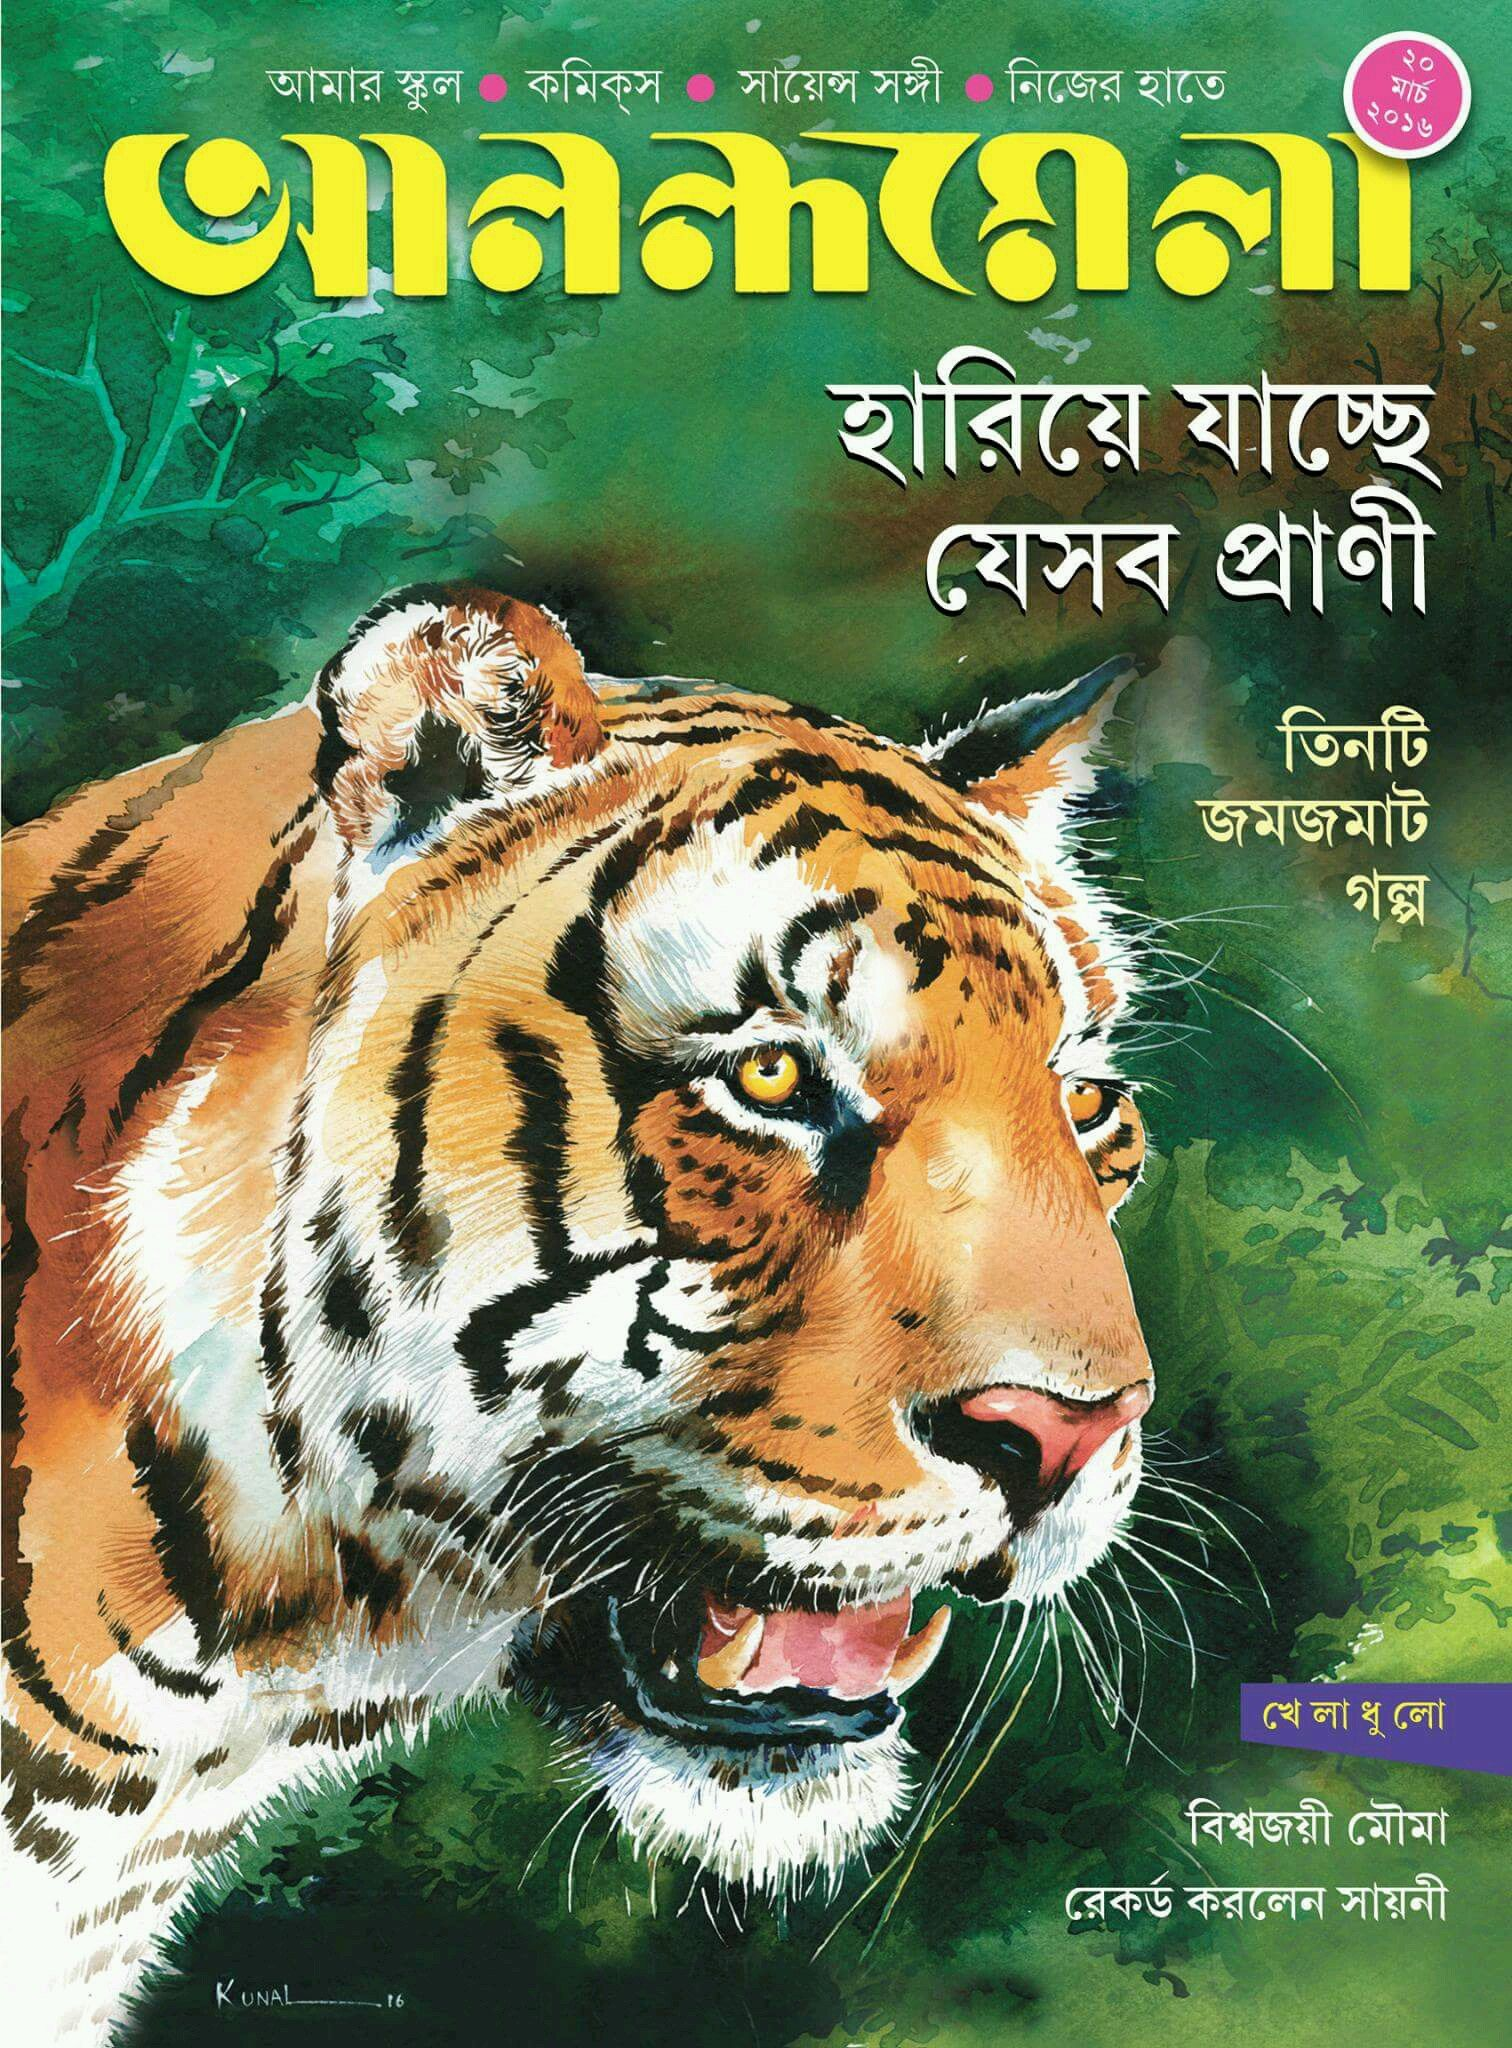 Buy Anandamela March 20 2016 Read Bengali Books Online Books Online Pdf Books Pdf Books Download